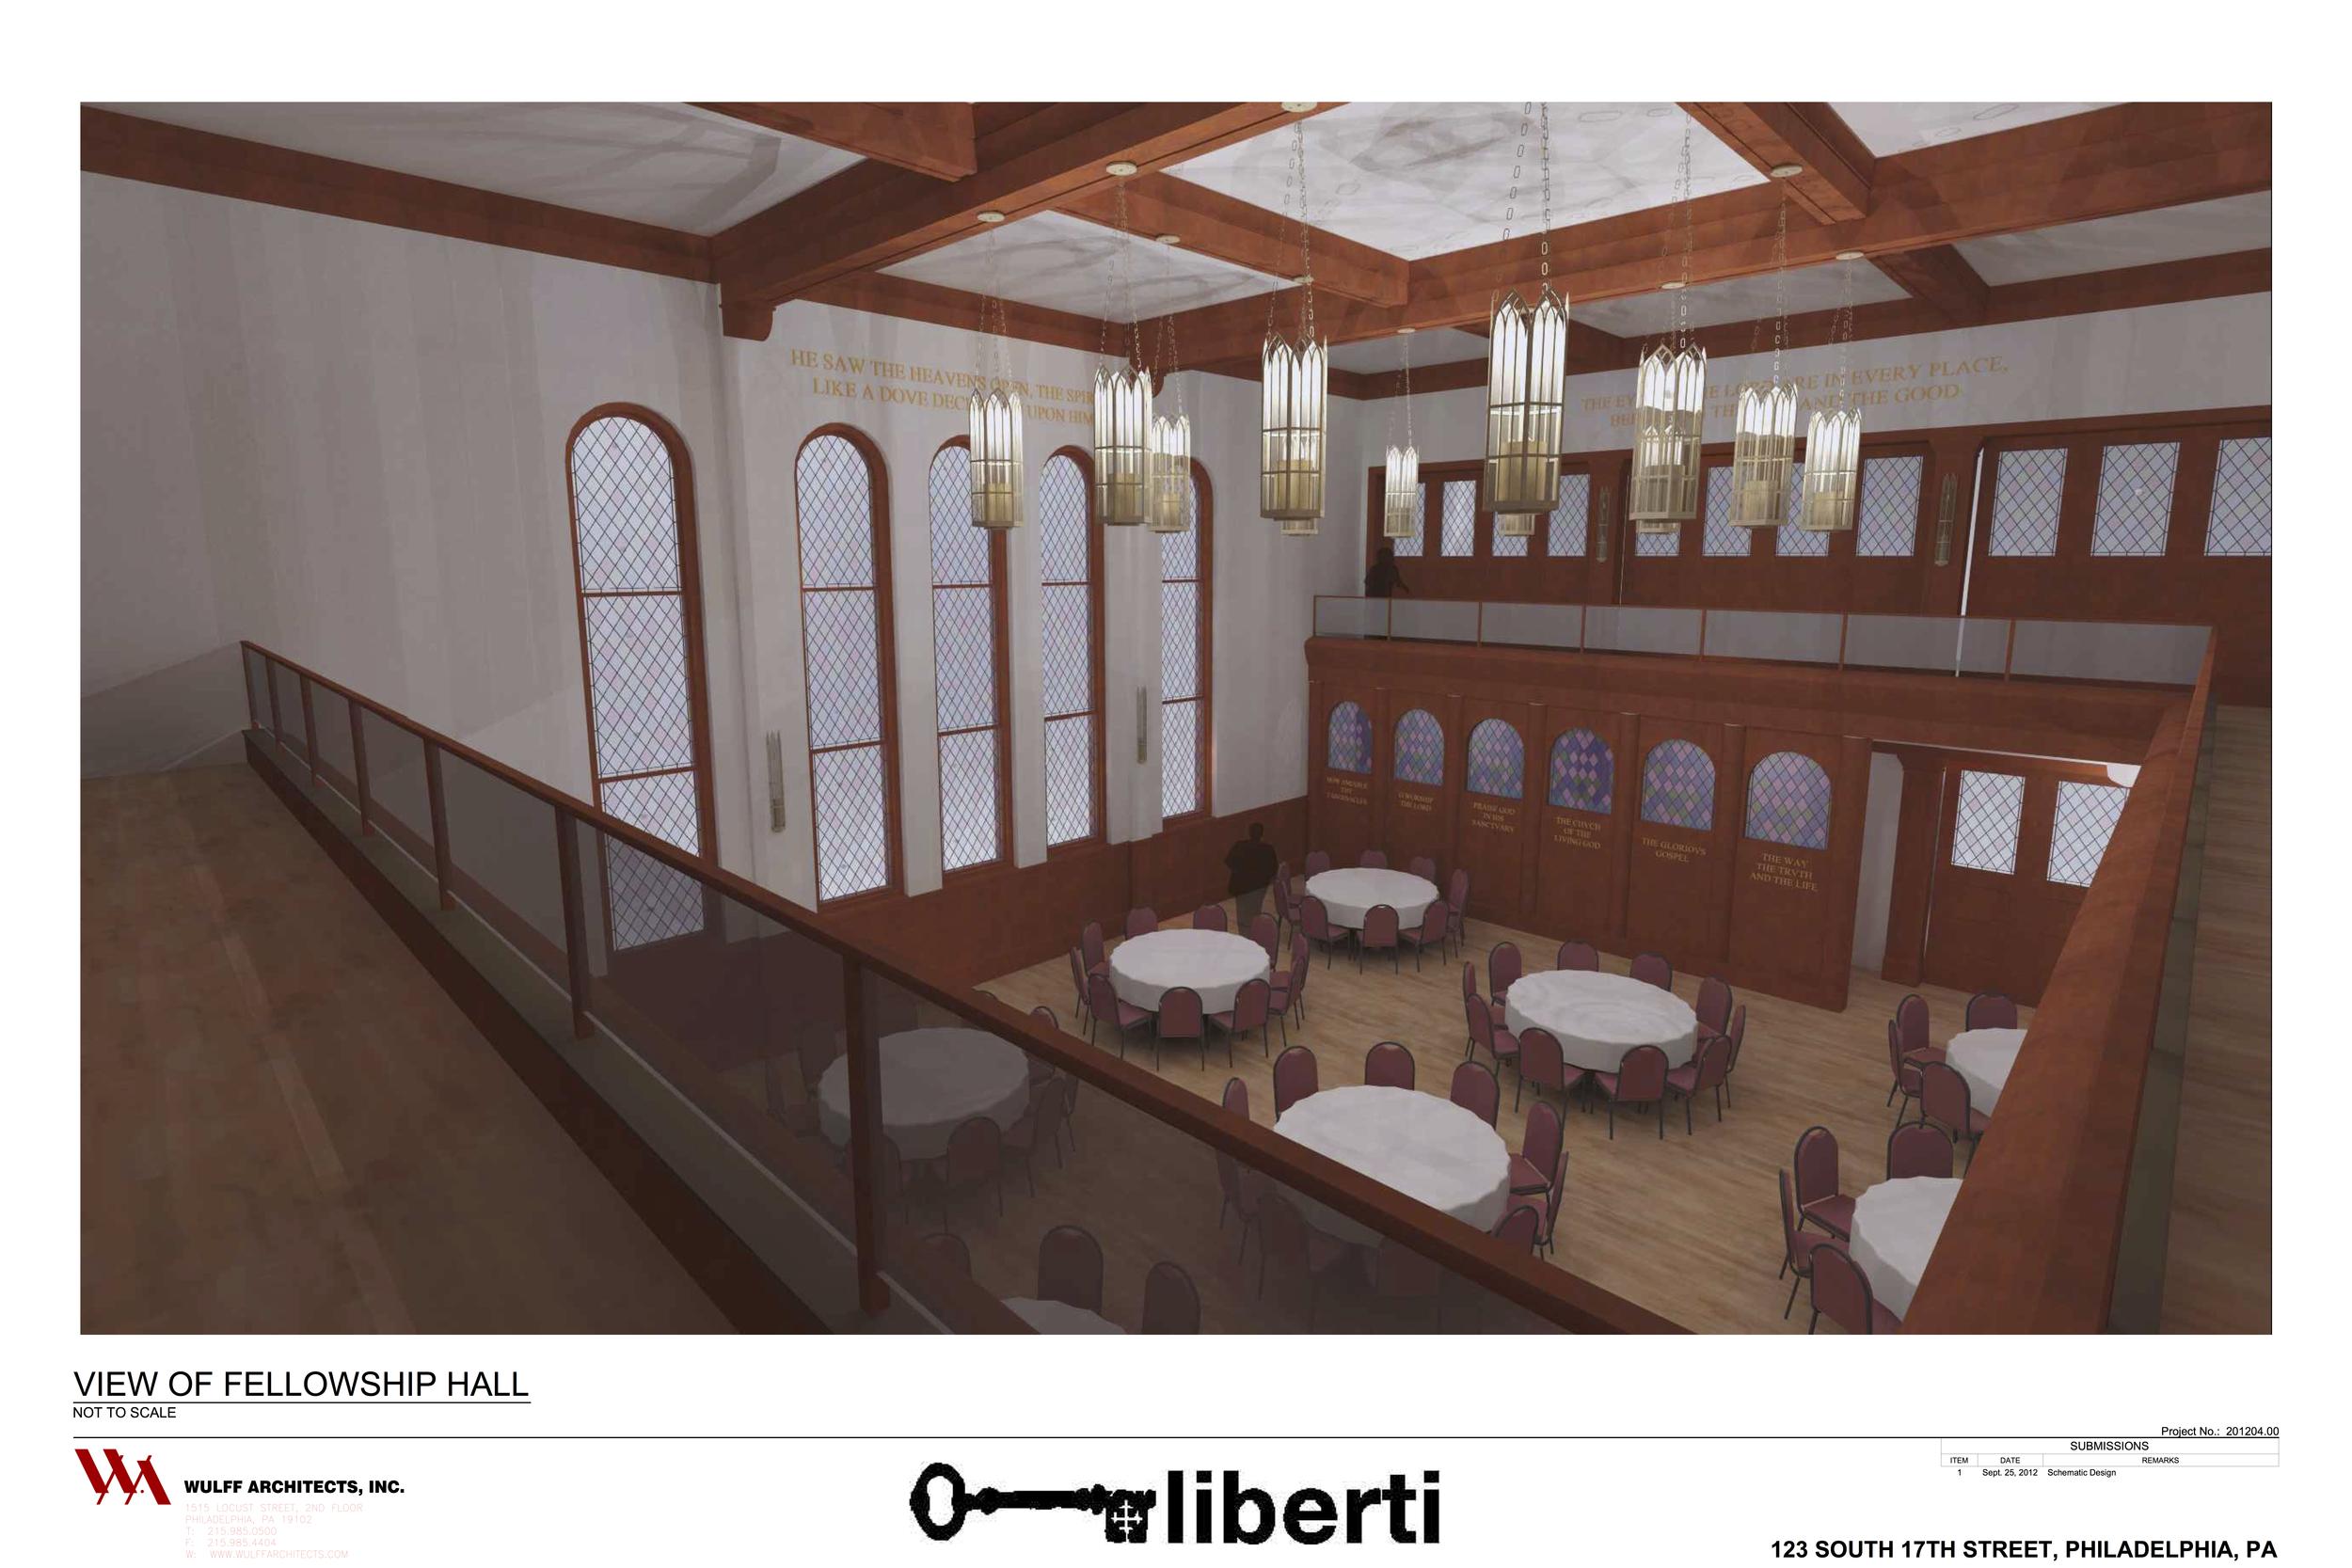 Liberti_Presentation Boards_Final, 09-25-14.jpg